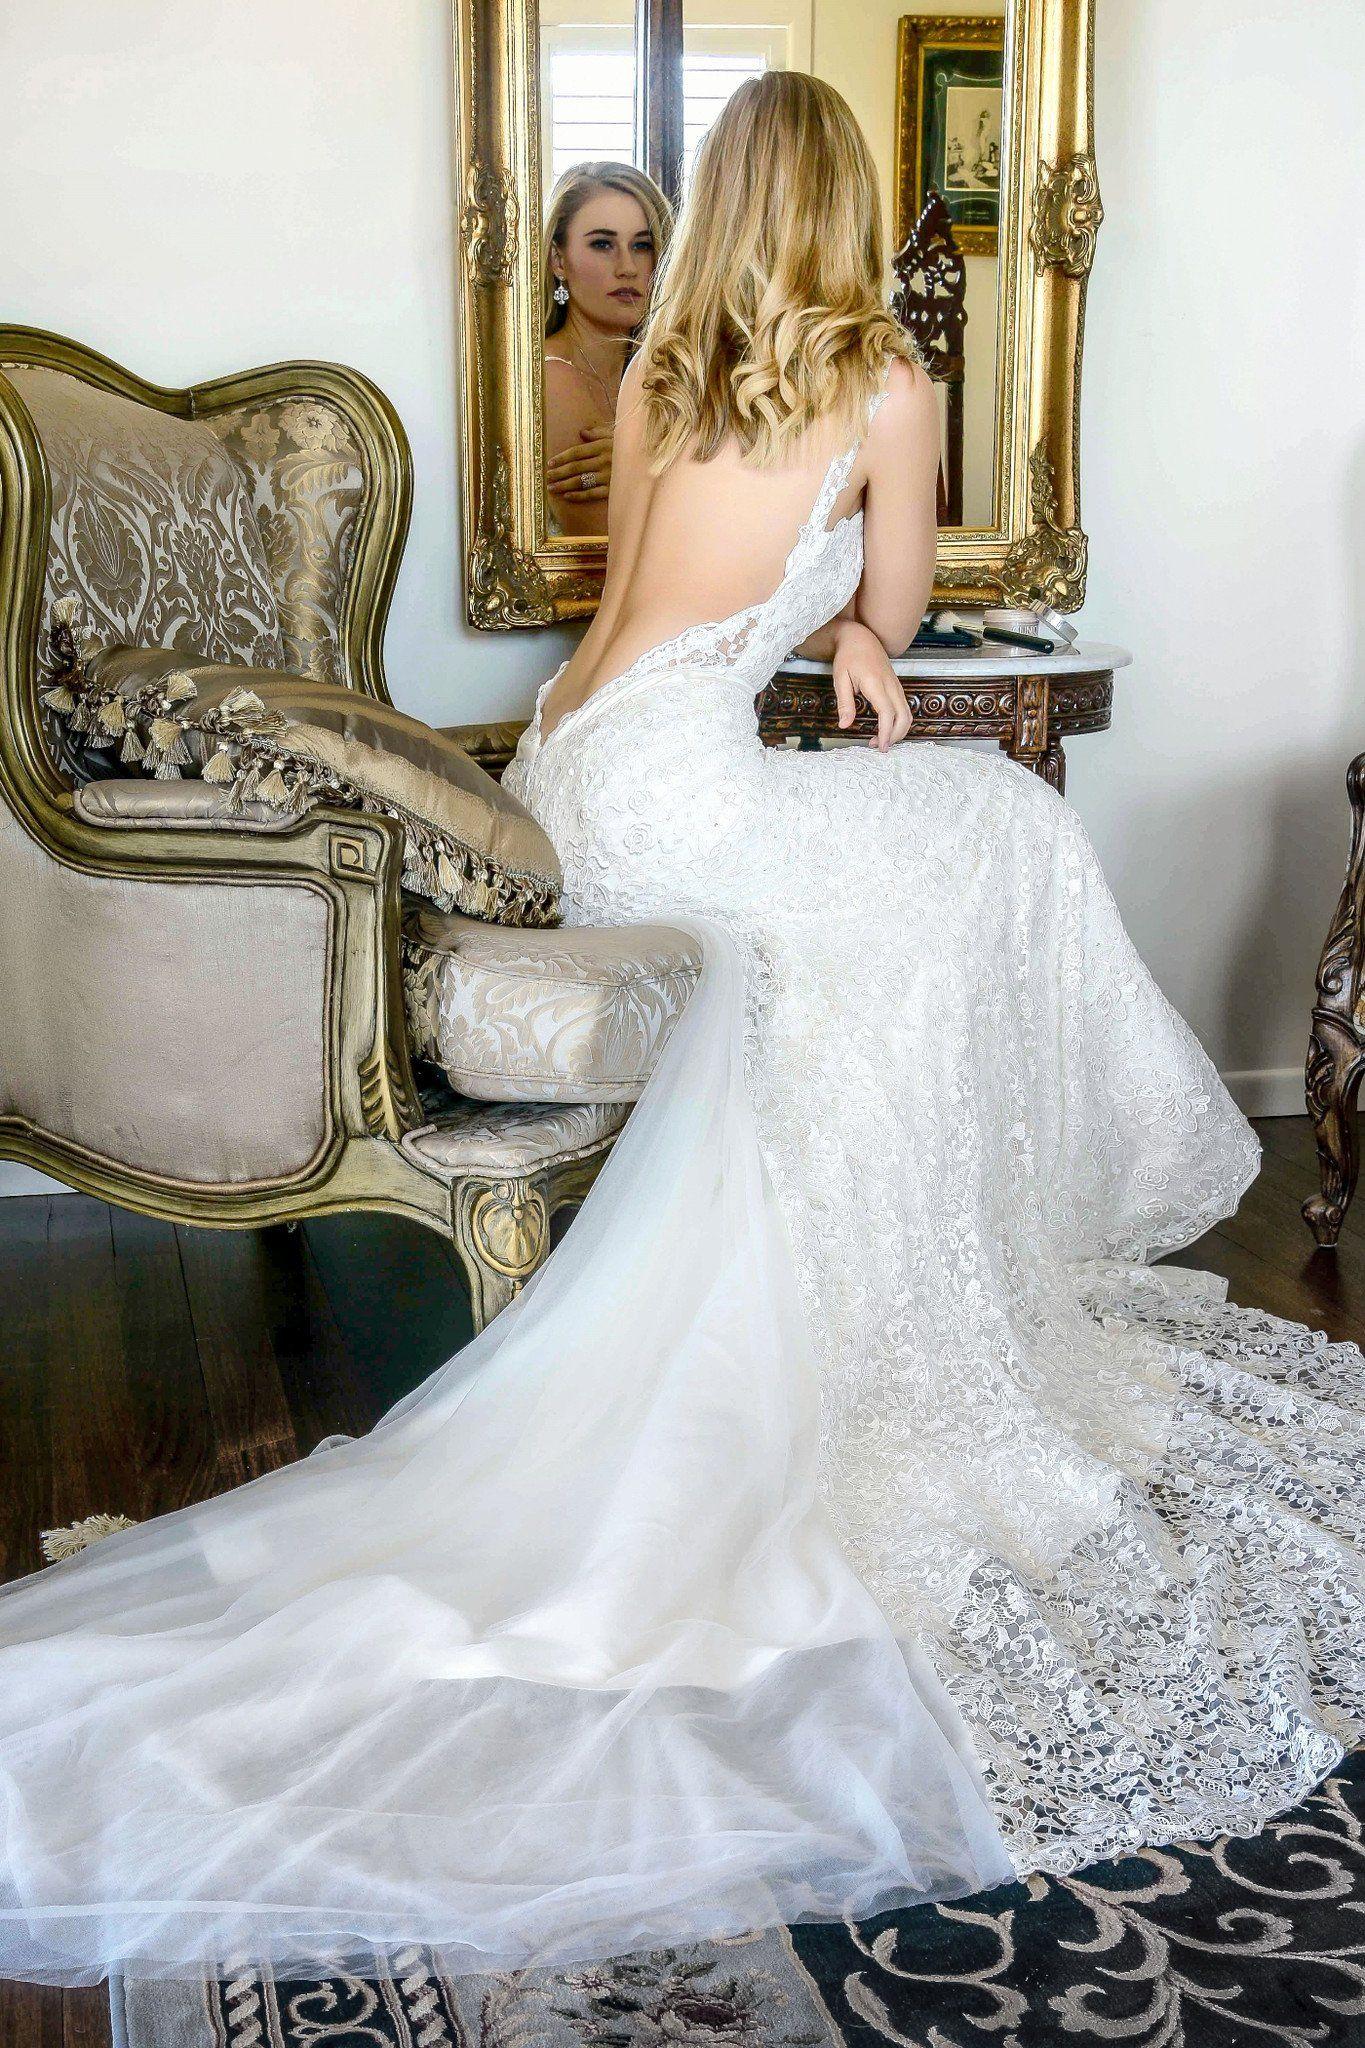 Tahia - low back lace wedding dress Gold Coast | The GC bridal ...